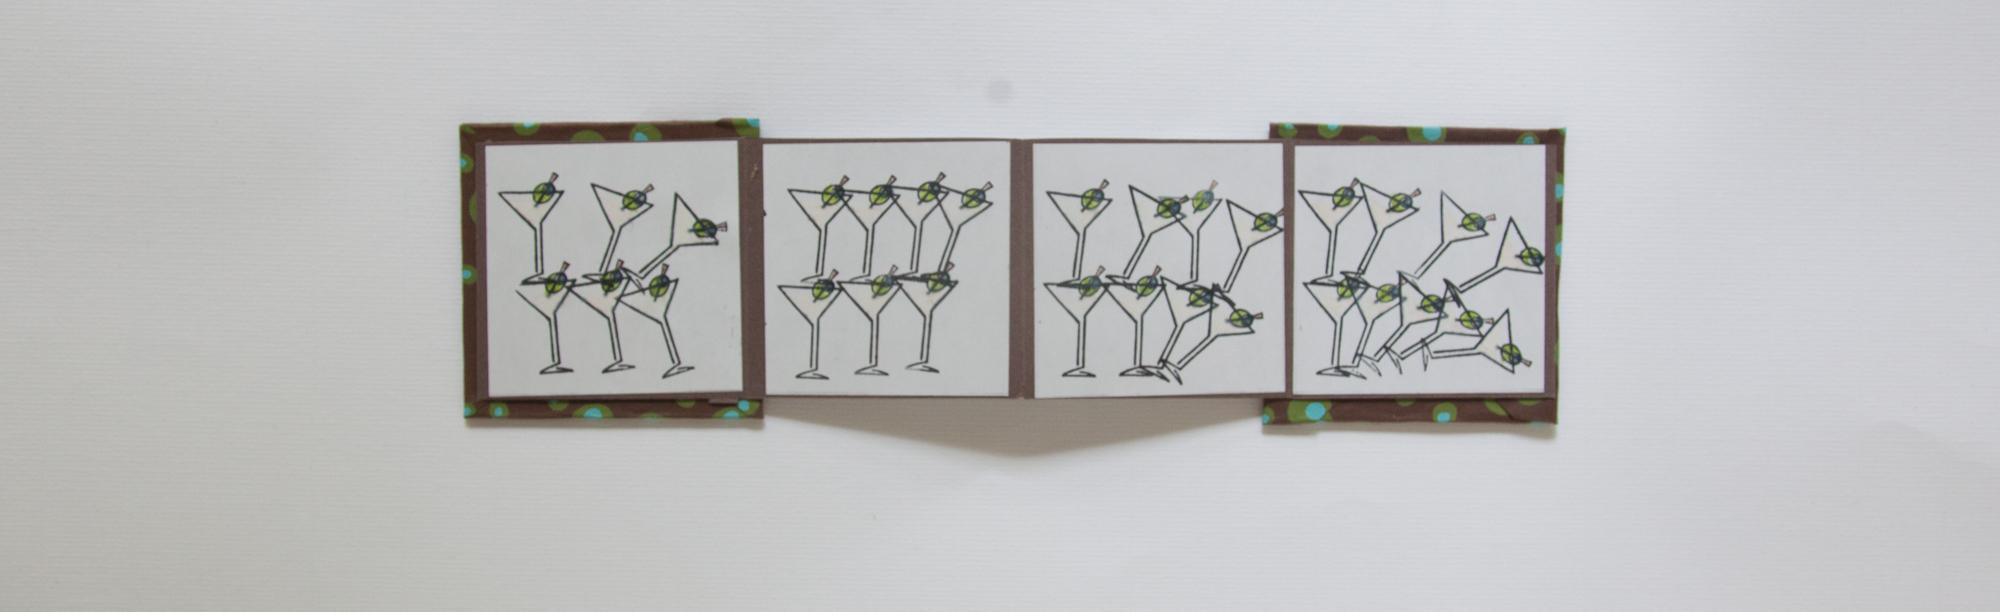 101_45 Martinis (2008)_.jpg